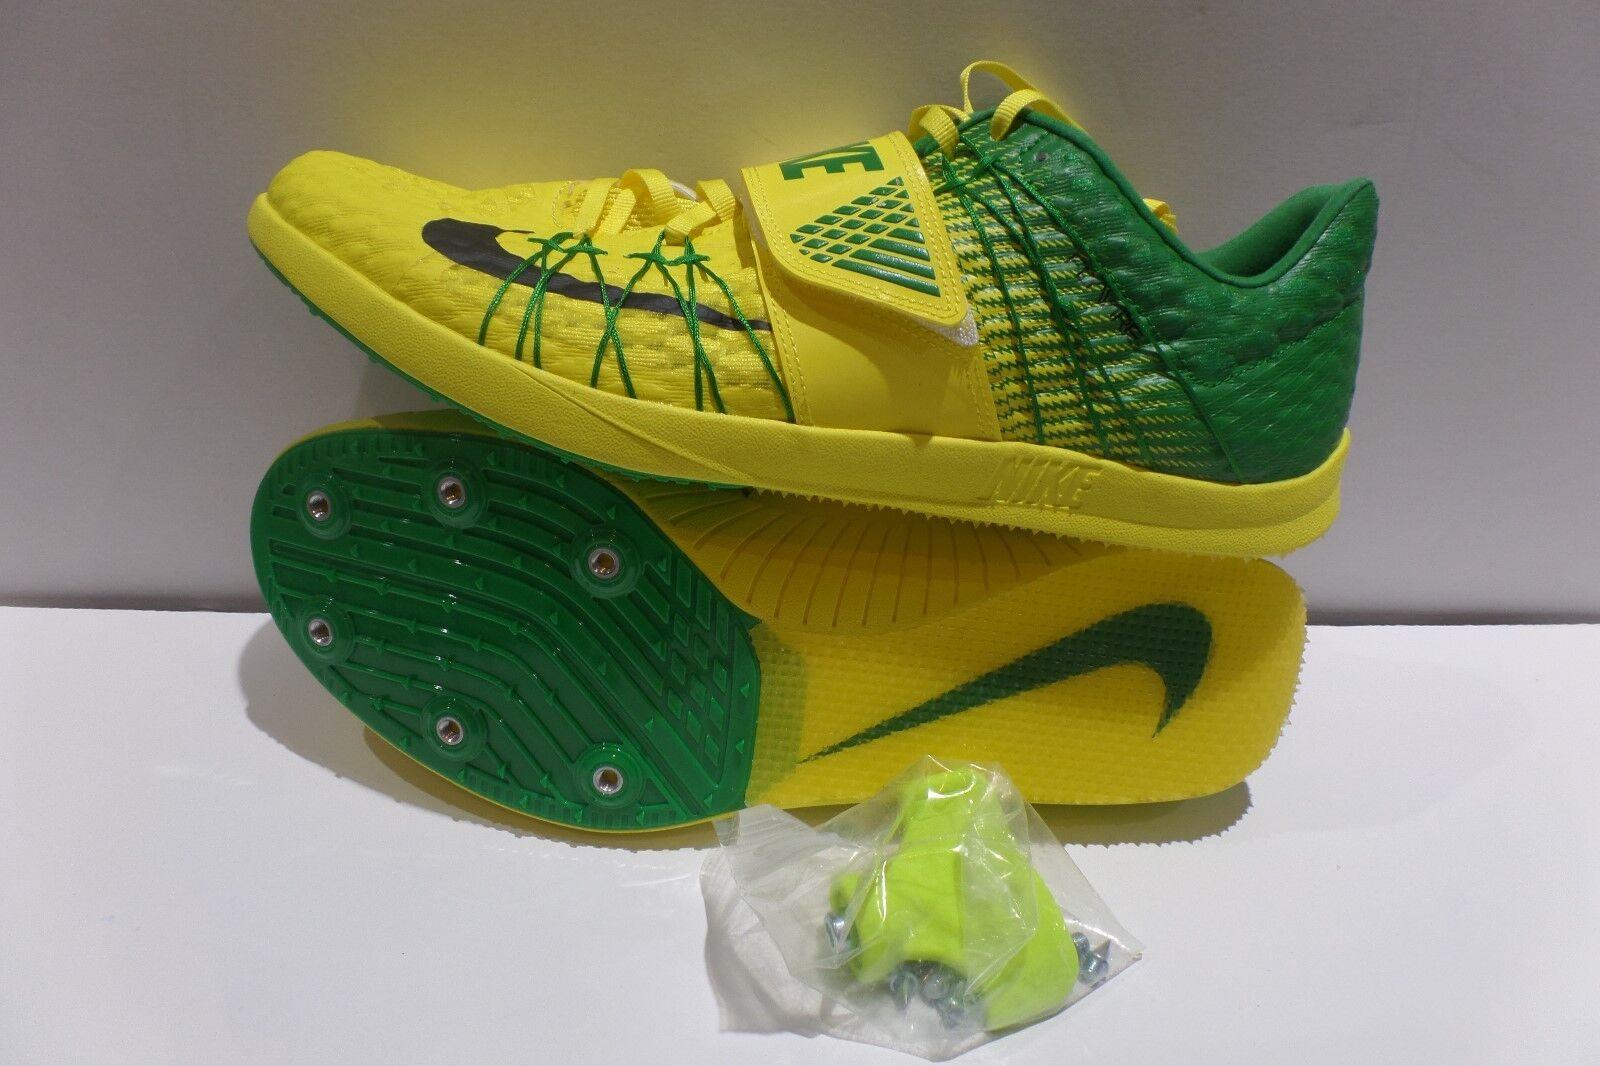 Nike Zoom TJ Elite Oregon Track Spike shoes Yellow 920760-703 Mens Size 11.5